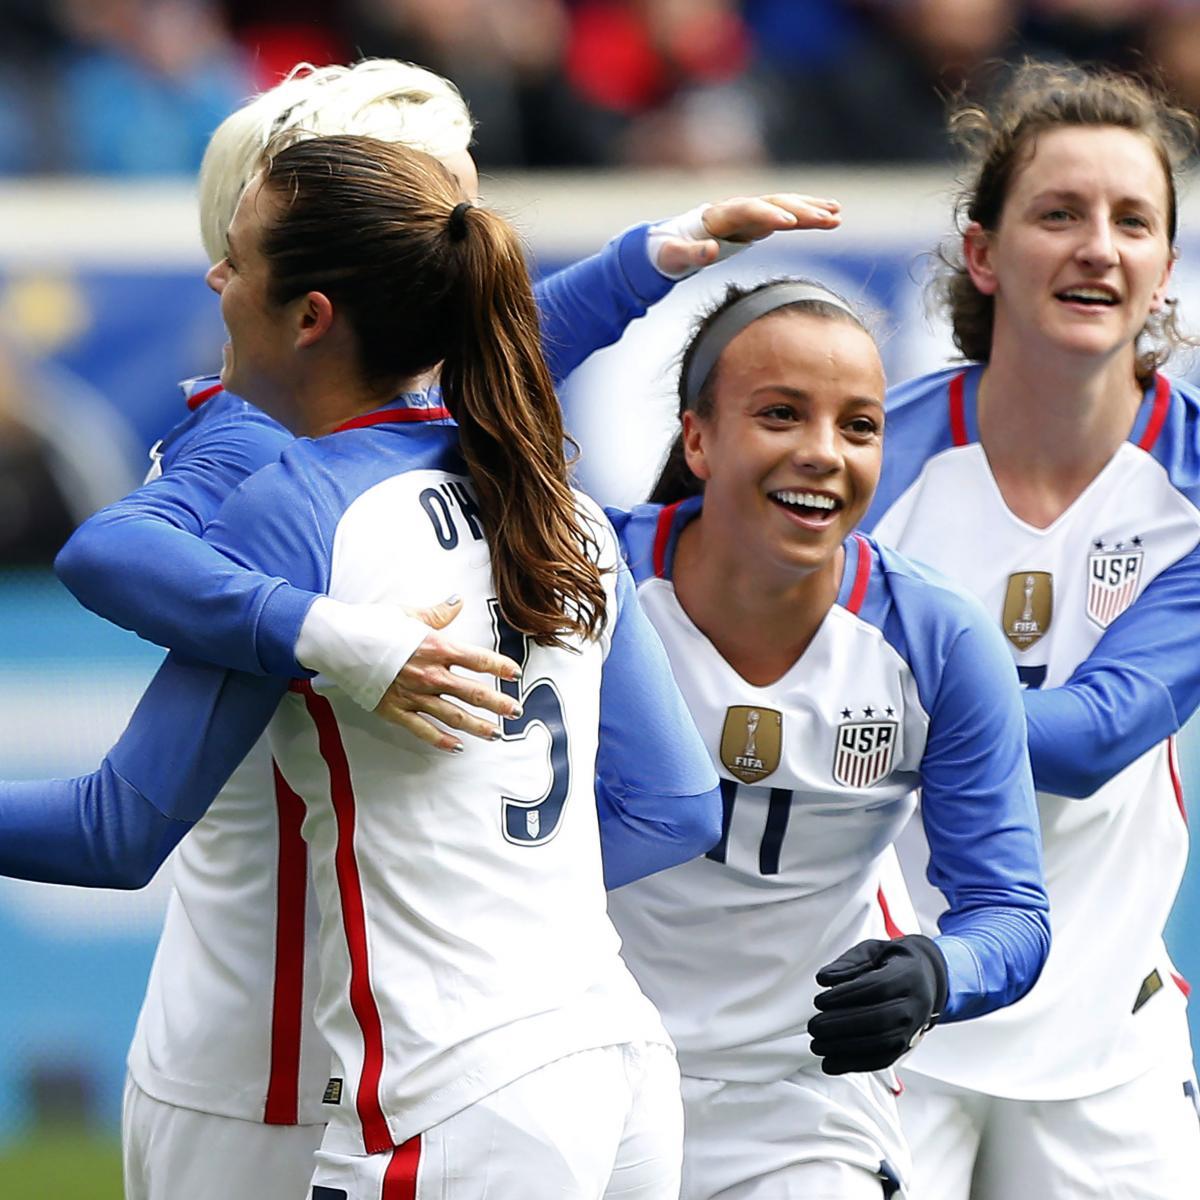 USA Vs. England Women's Soccer: Date, Time, Live Stream